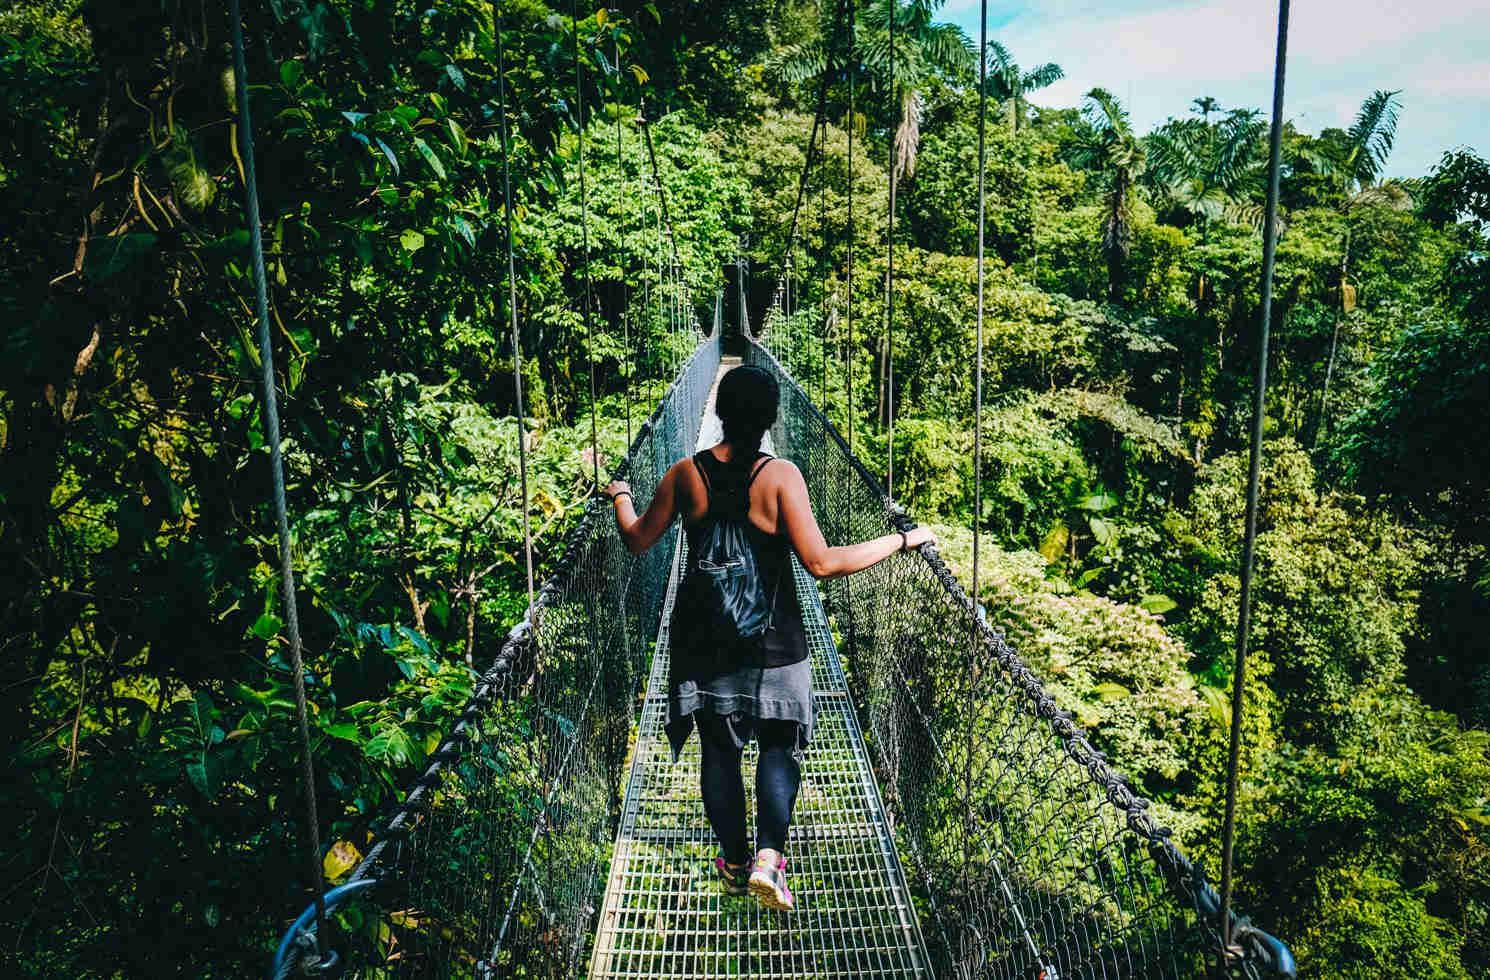 In Costa Rica im Regenwald unterwegs